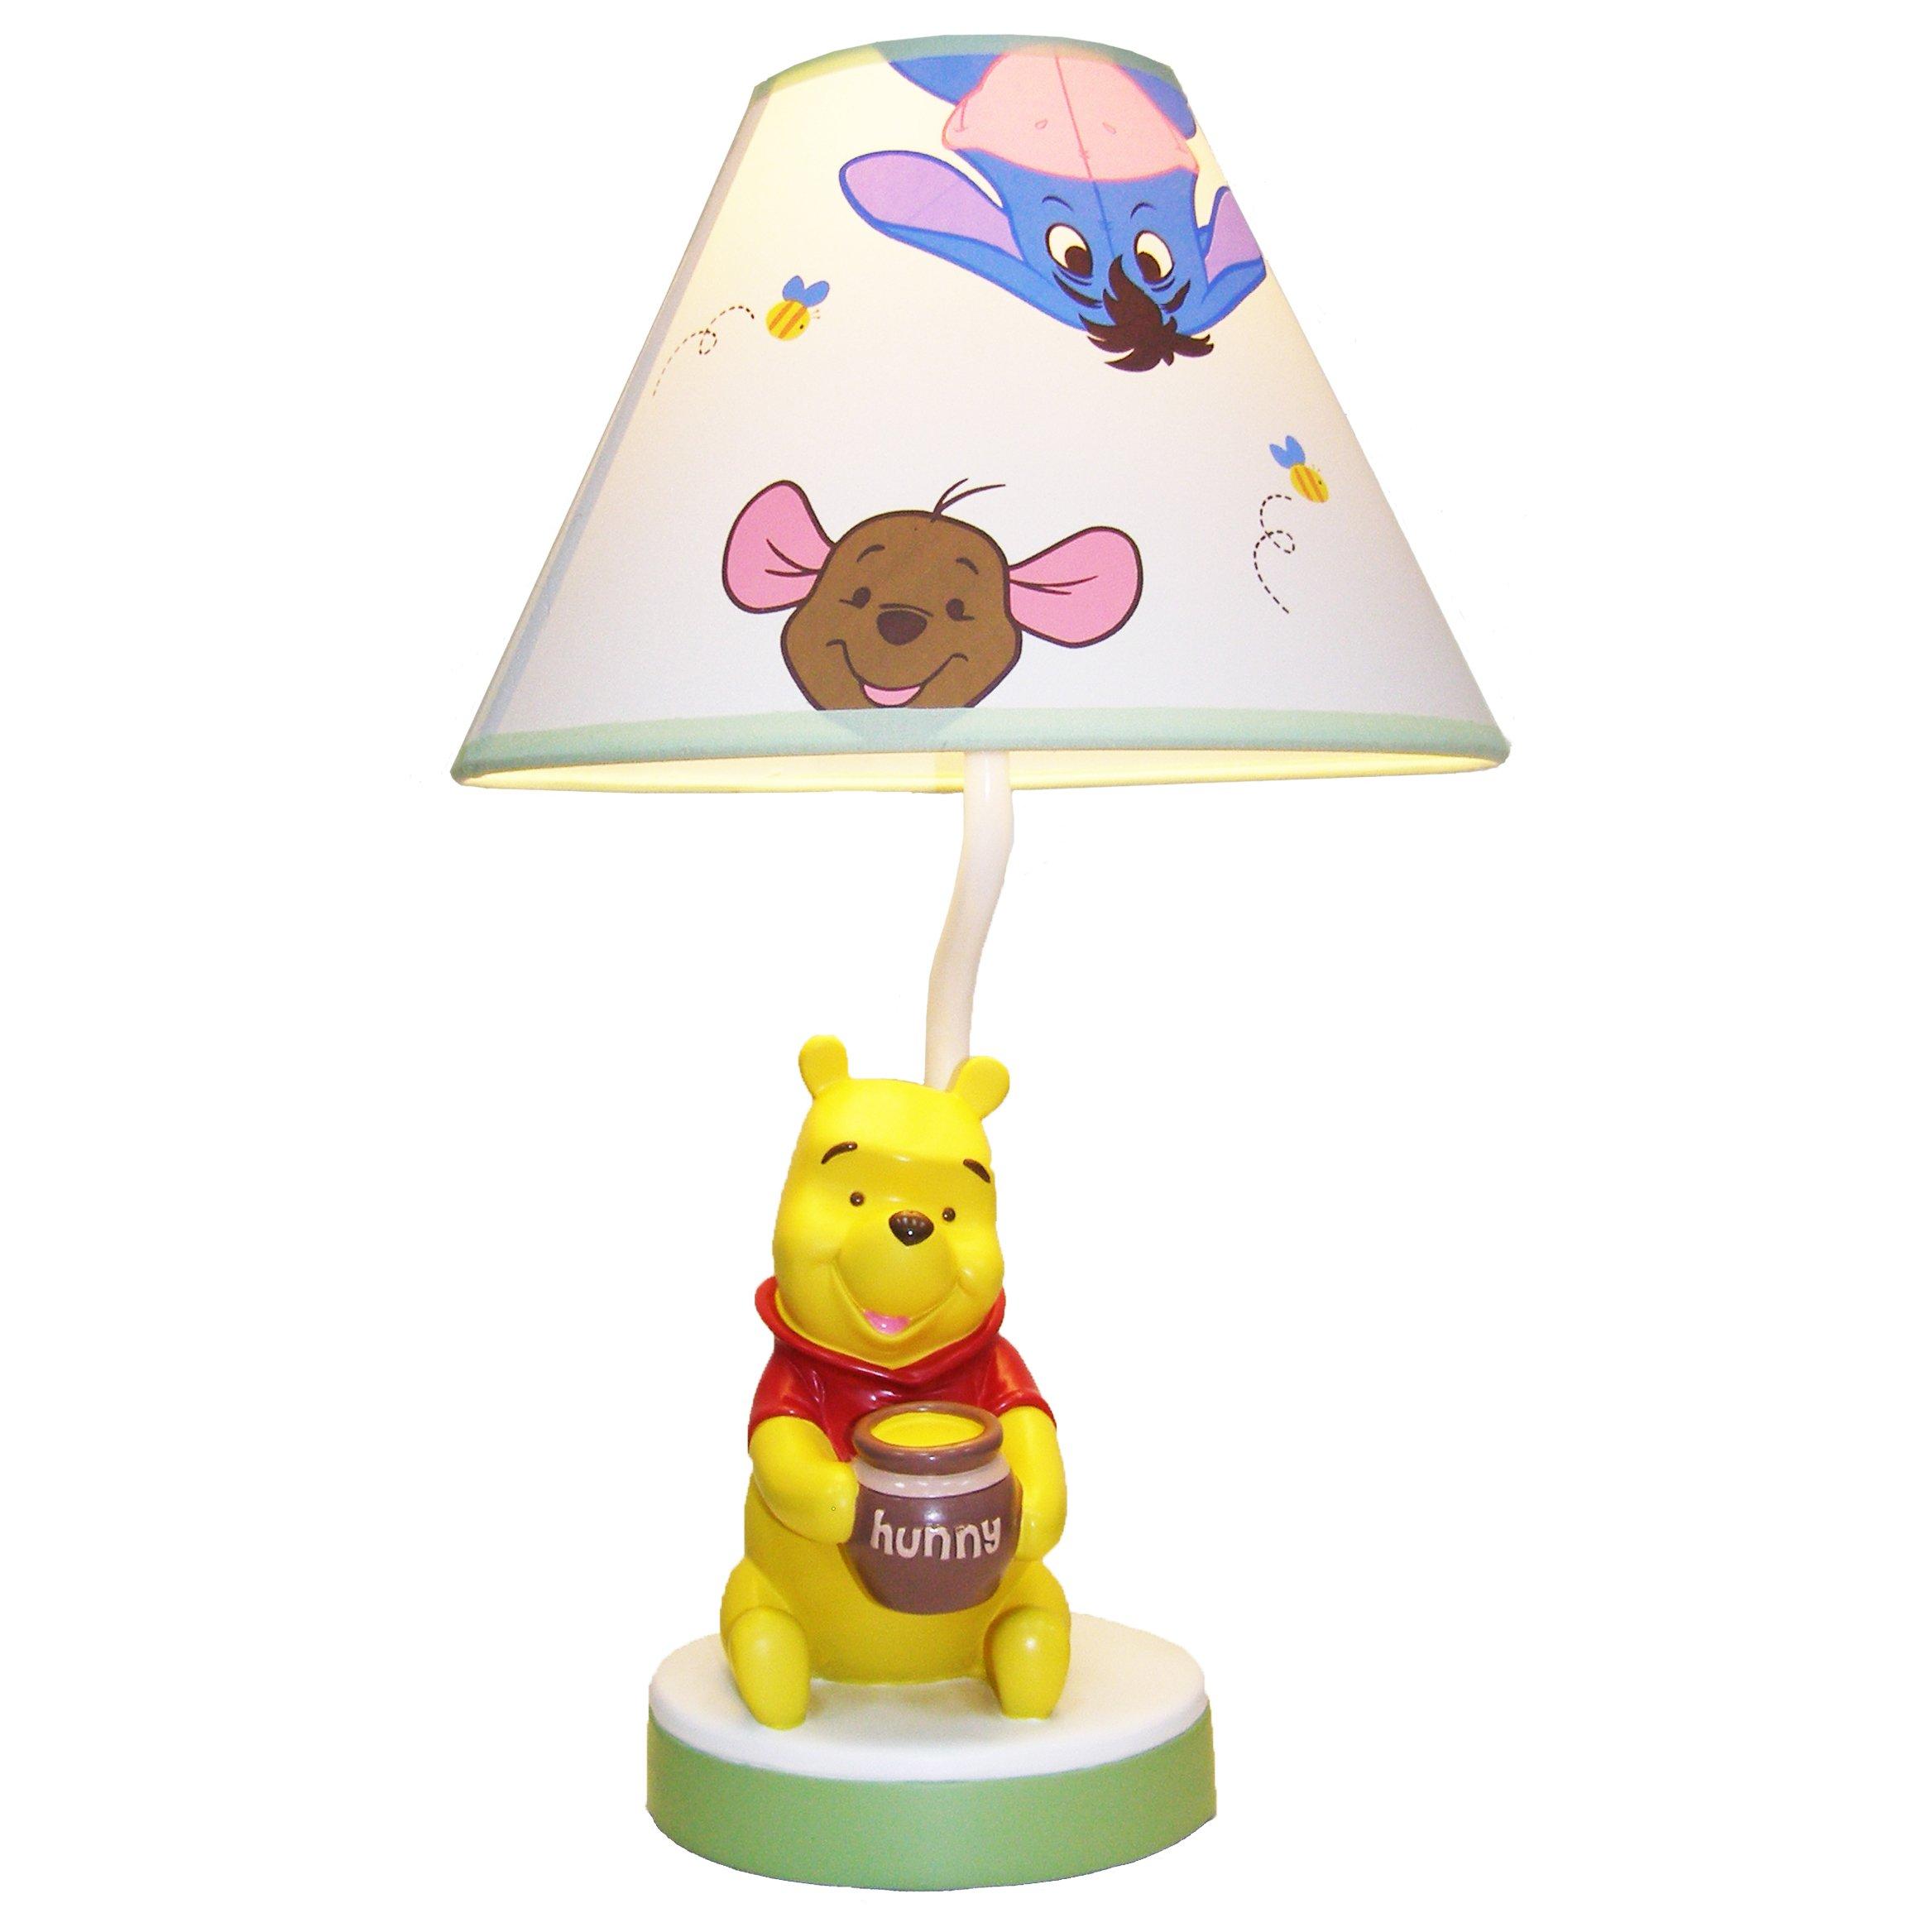 Disney Winnie the Peeking Pooh Lamp Base and Shade, Yellow/Red/Sage/Blue